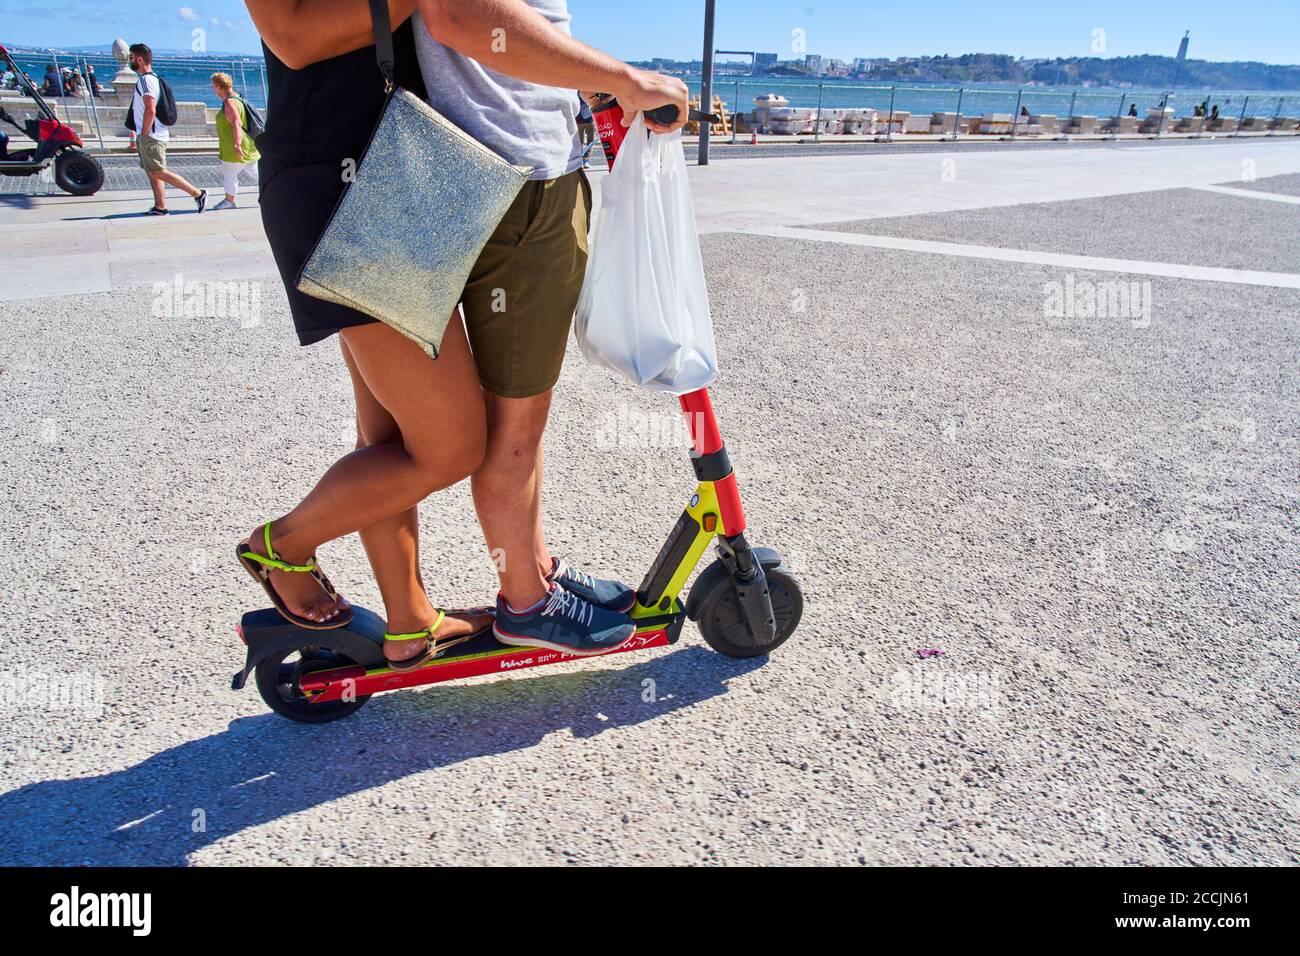 Lisbon, Lissabon, Portugal, 16rd August 2020.  A couple driving together on an e-scooter on Praca do Comercio. © Peter Schatz / Alamy Stock Photos Stock Photo